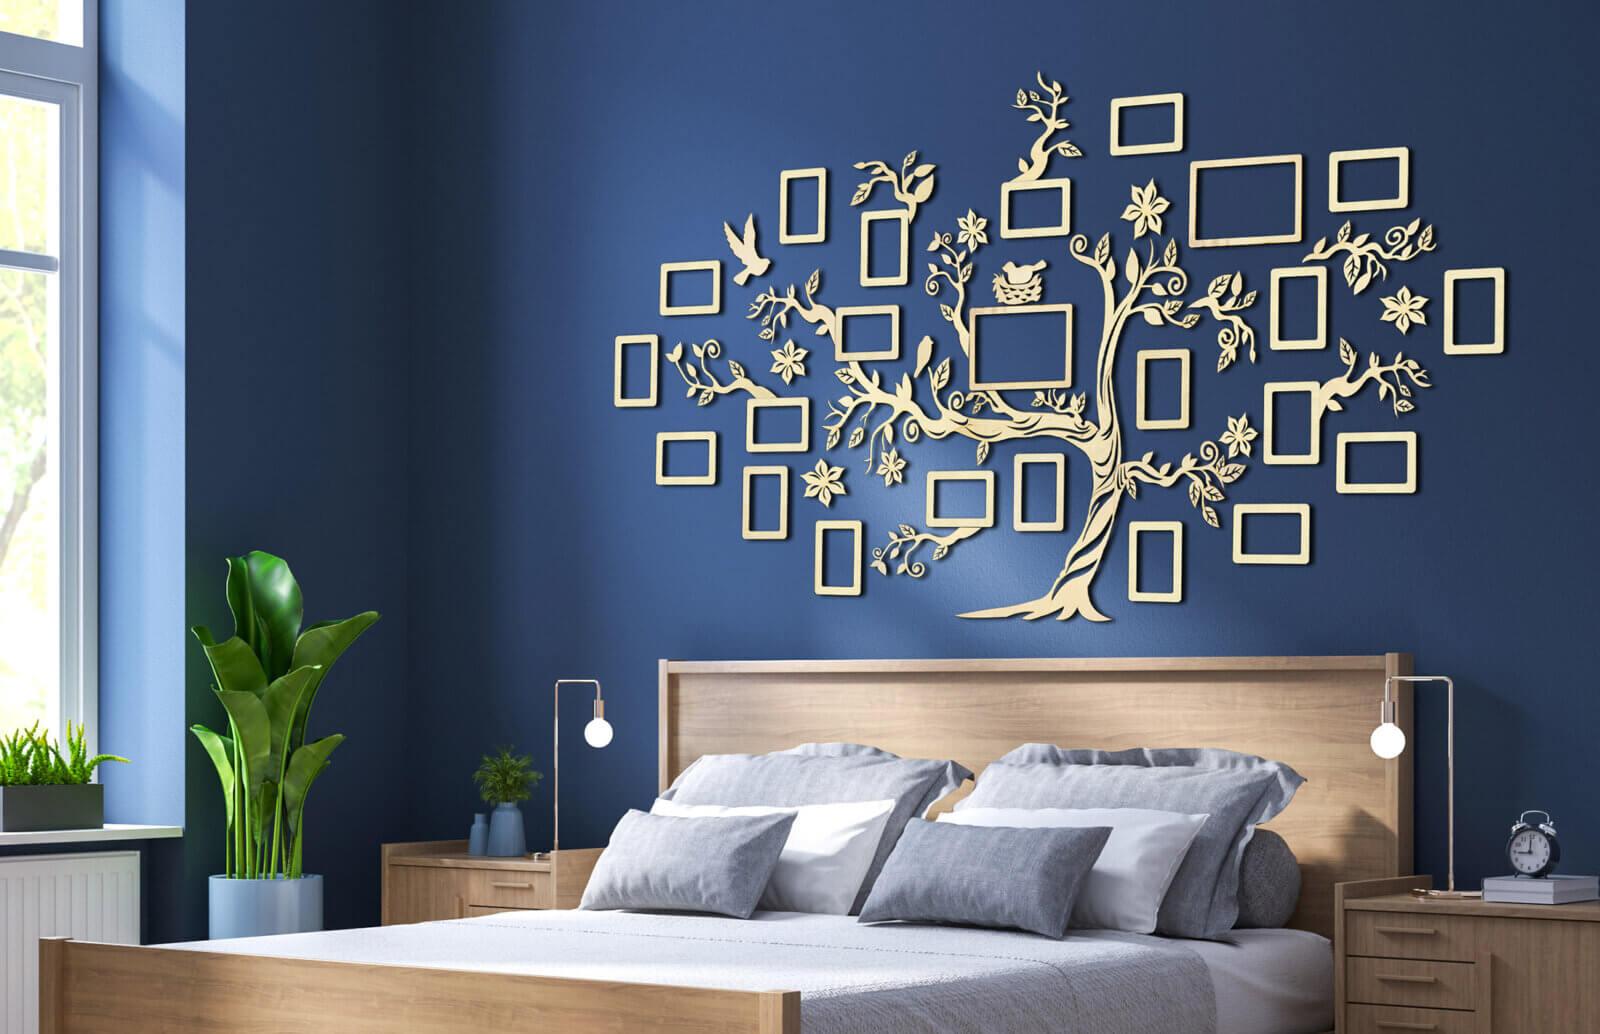 Wooden Family Tree - Wall Decoration